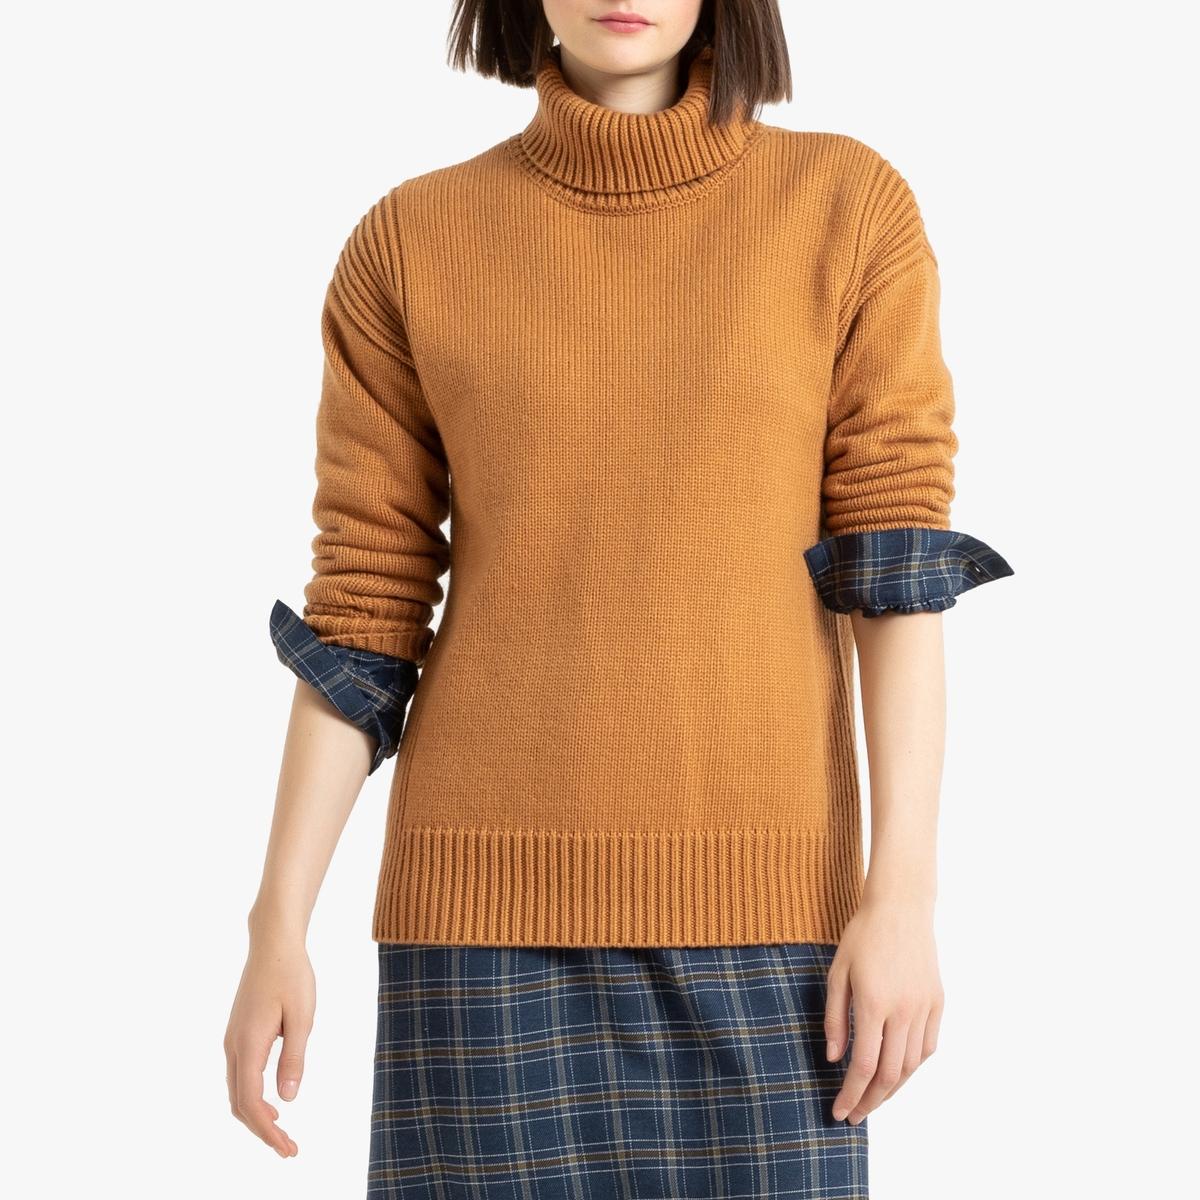 Фото - Свитер LaRedoute Крупной вязки M каштановый пуловер laredoute крупной вязки s синий